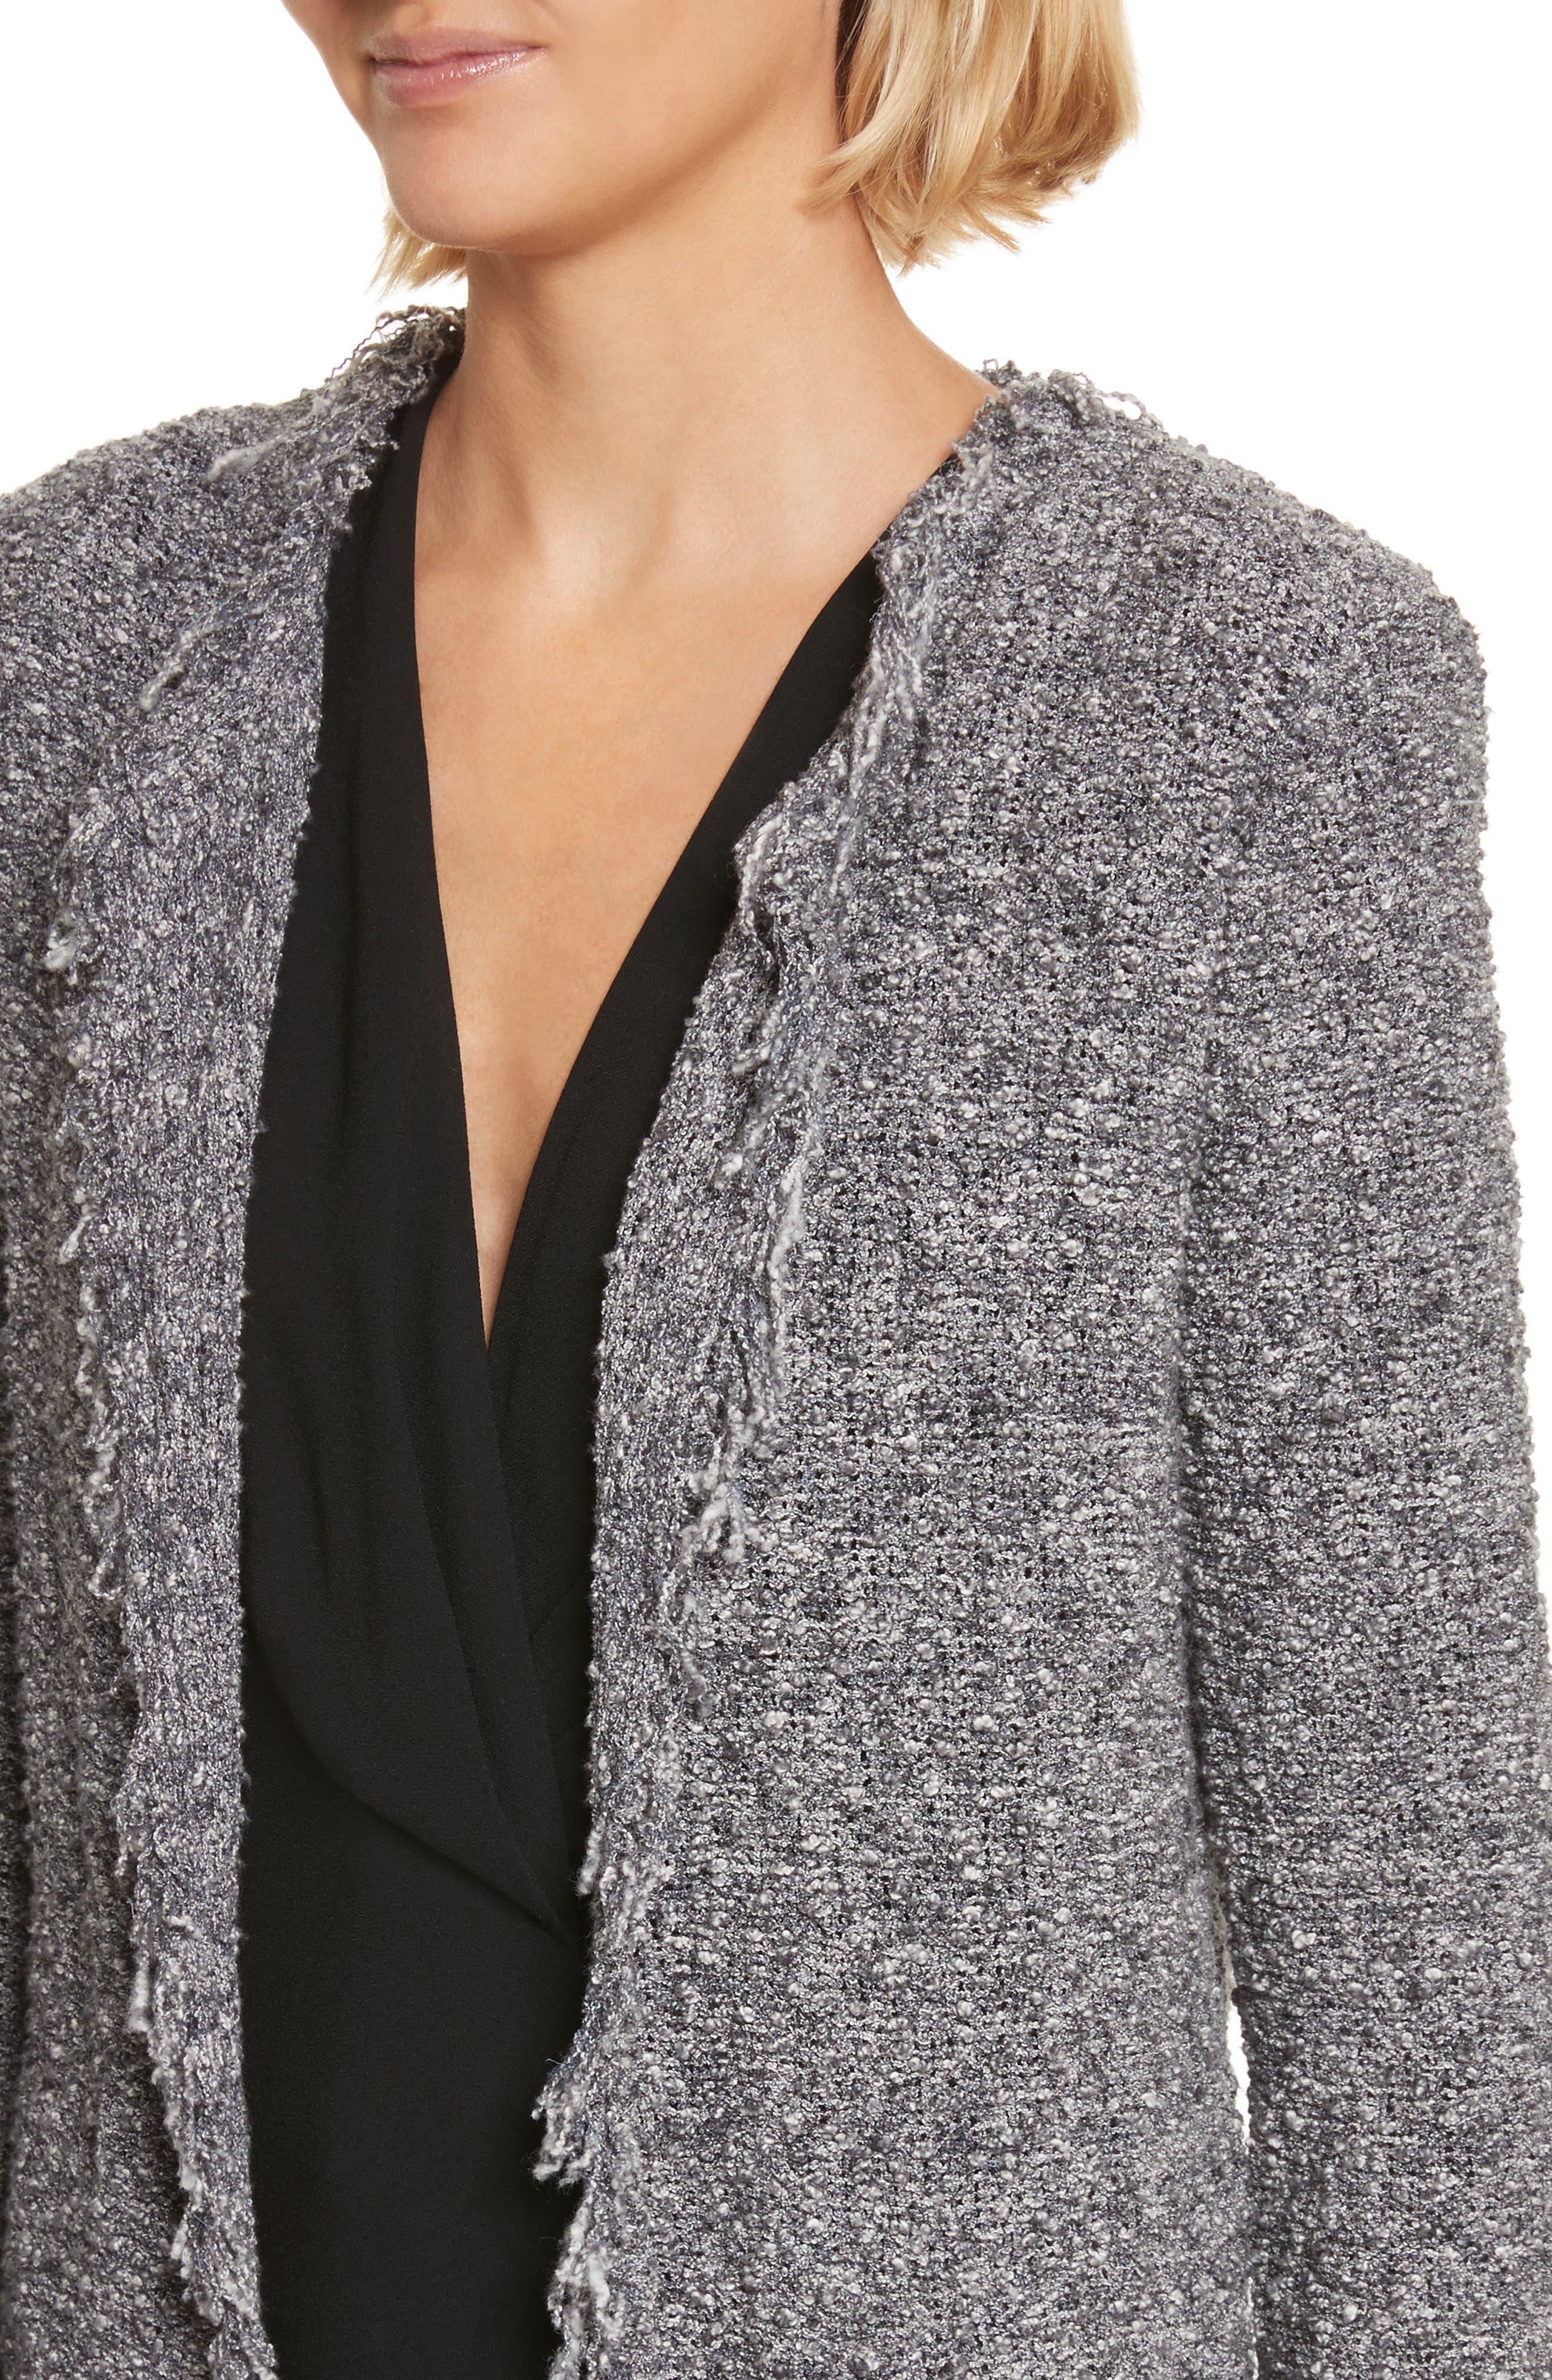 Shavanix Tweed Jacket,                             Alternate thumbnail 4, color,                             021